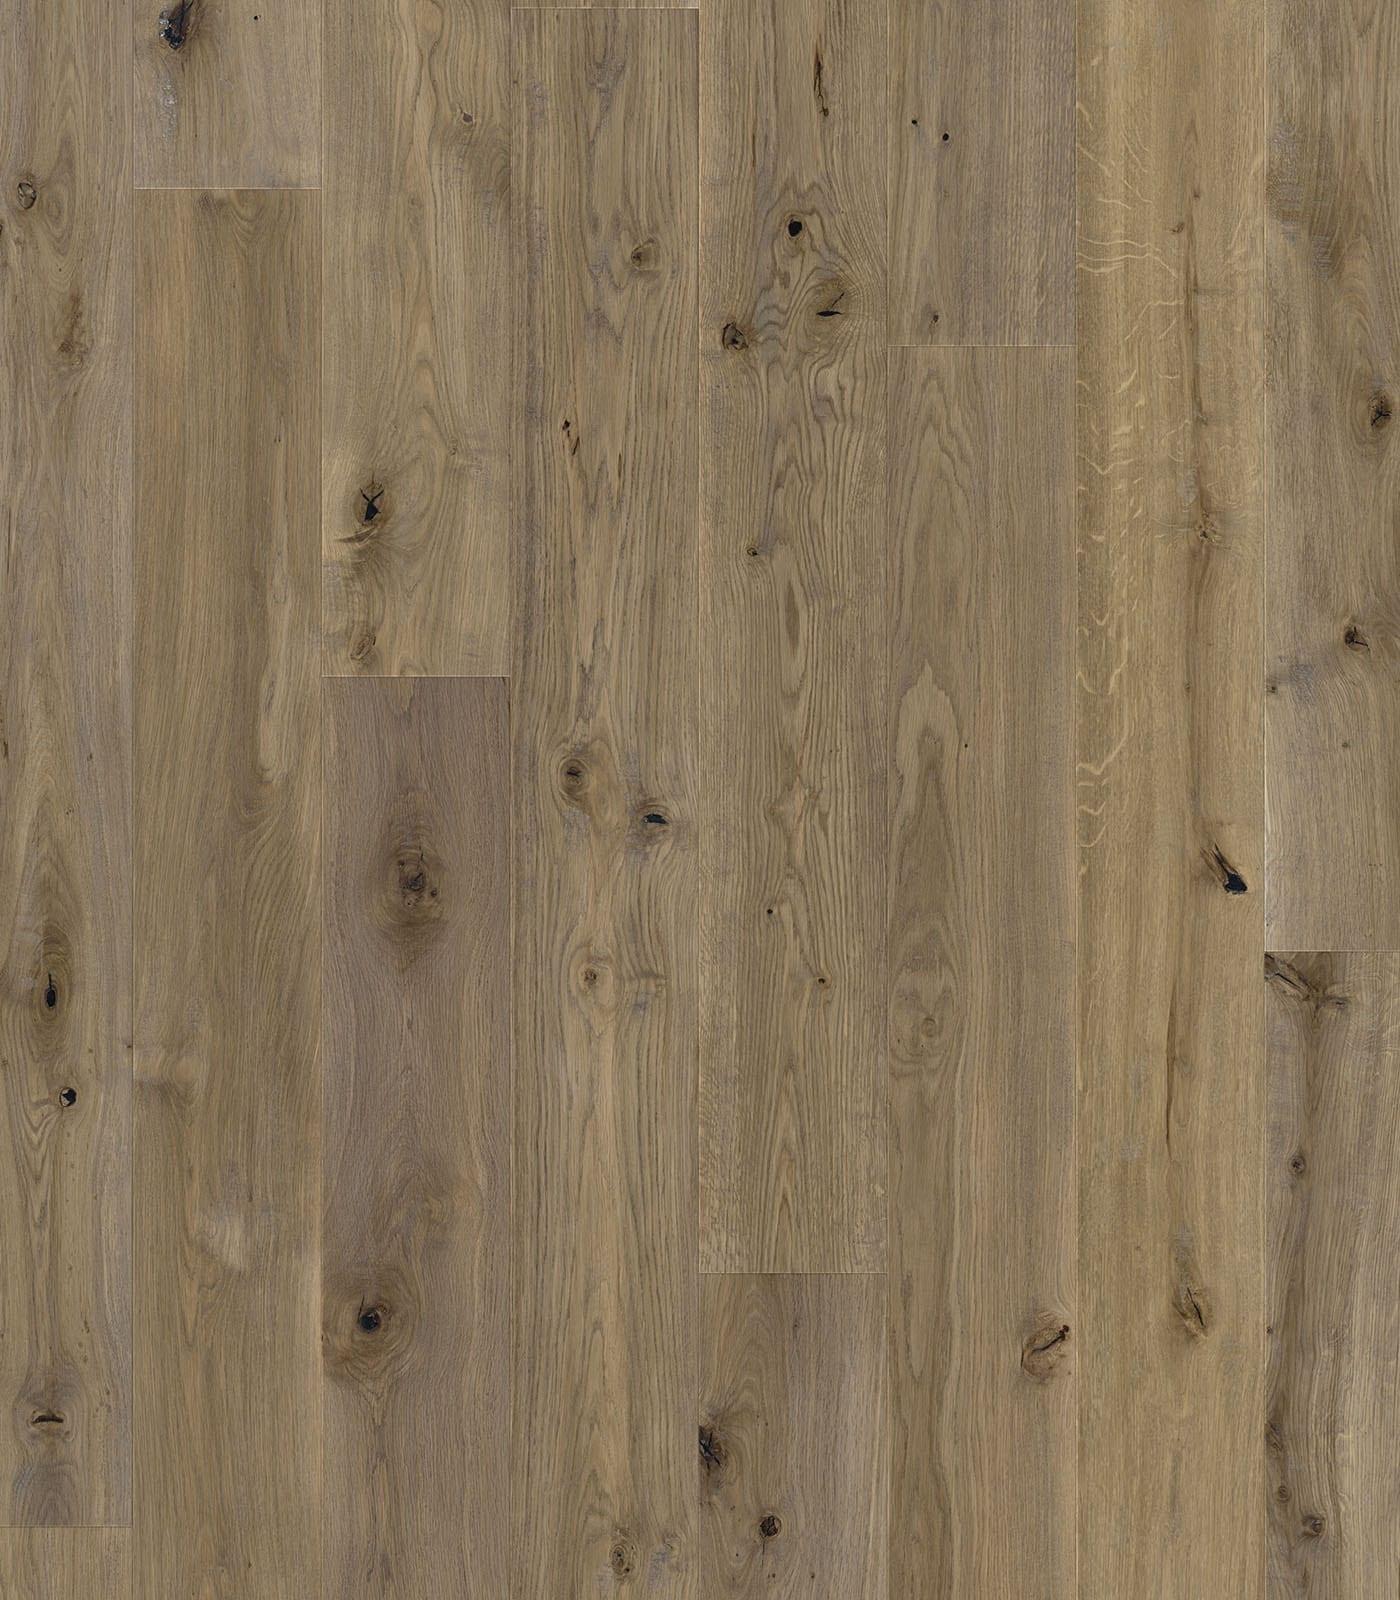 Etosha-Lifestyle Collection-European Oak Floors-flat